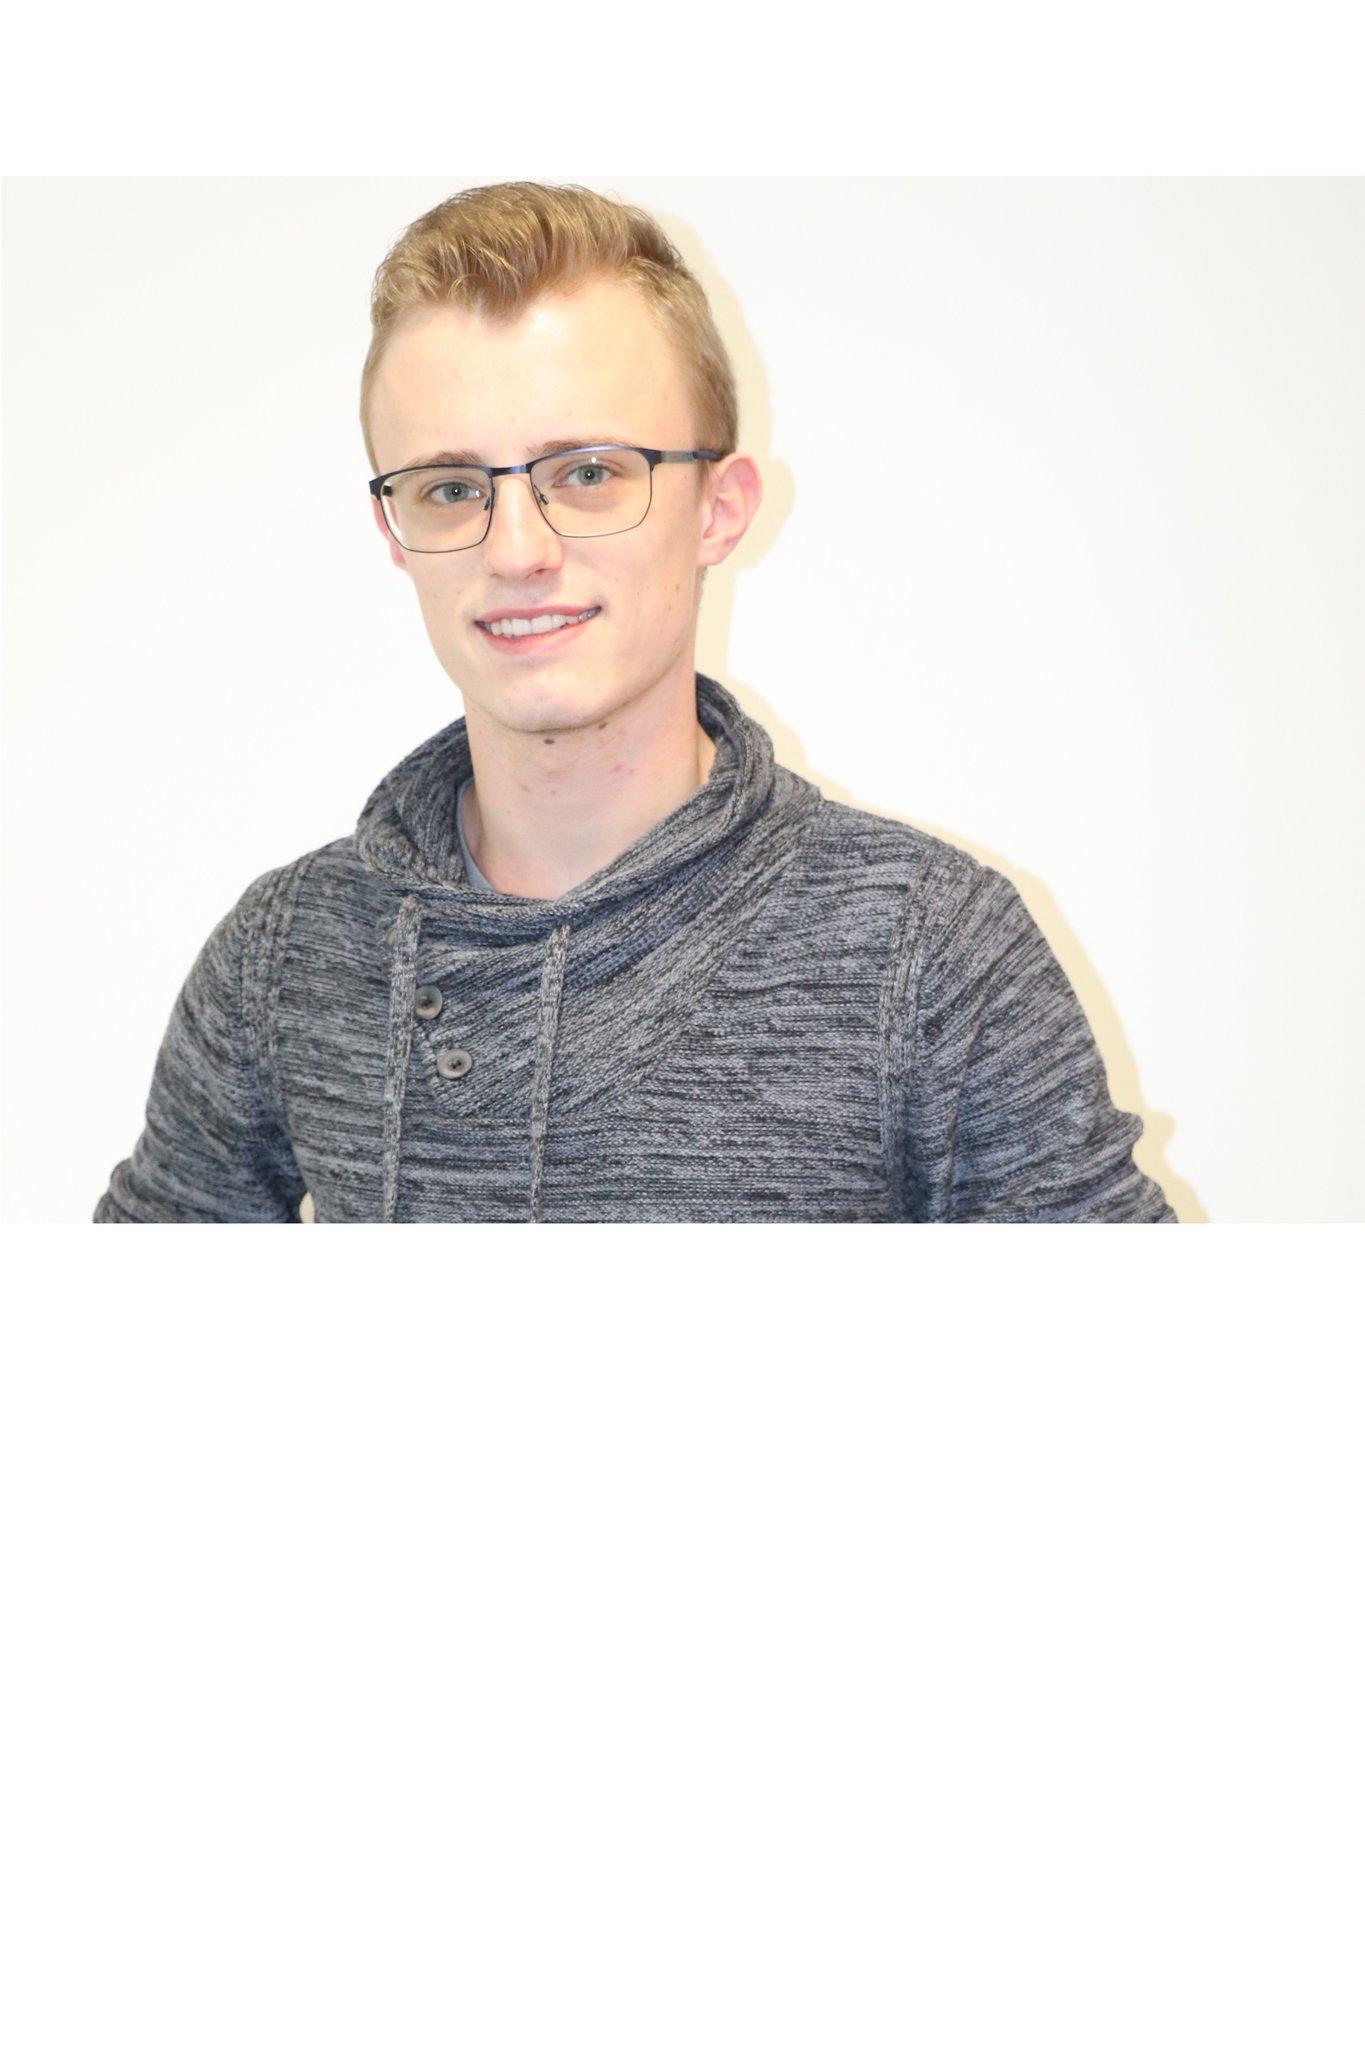 Lukas Schärding